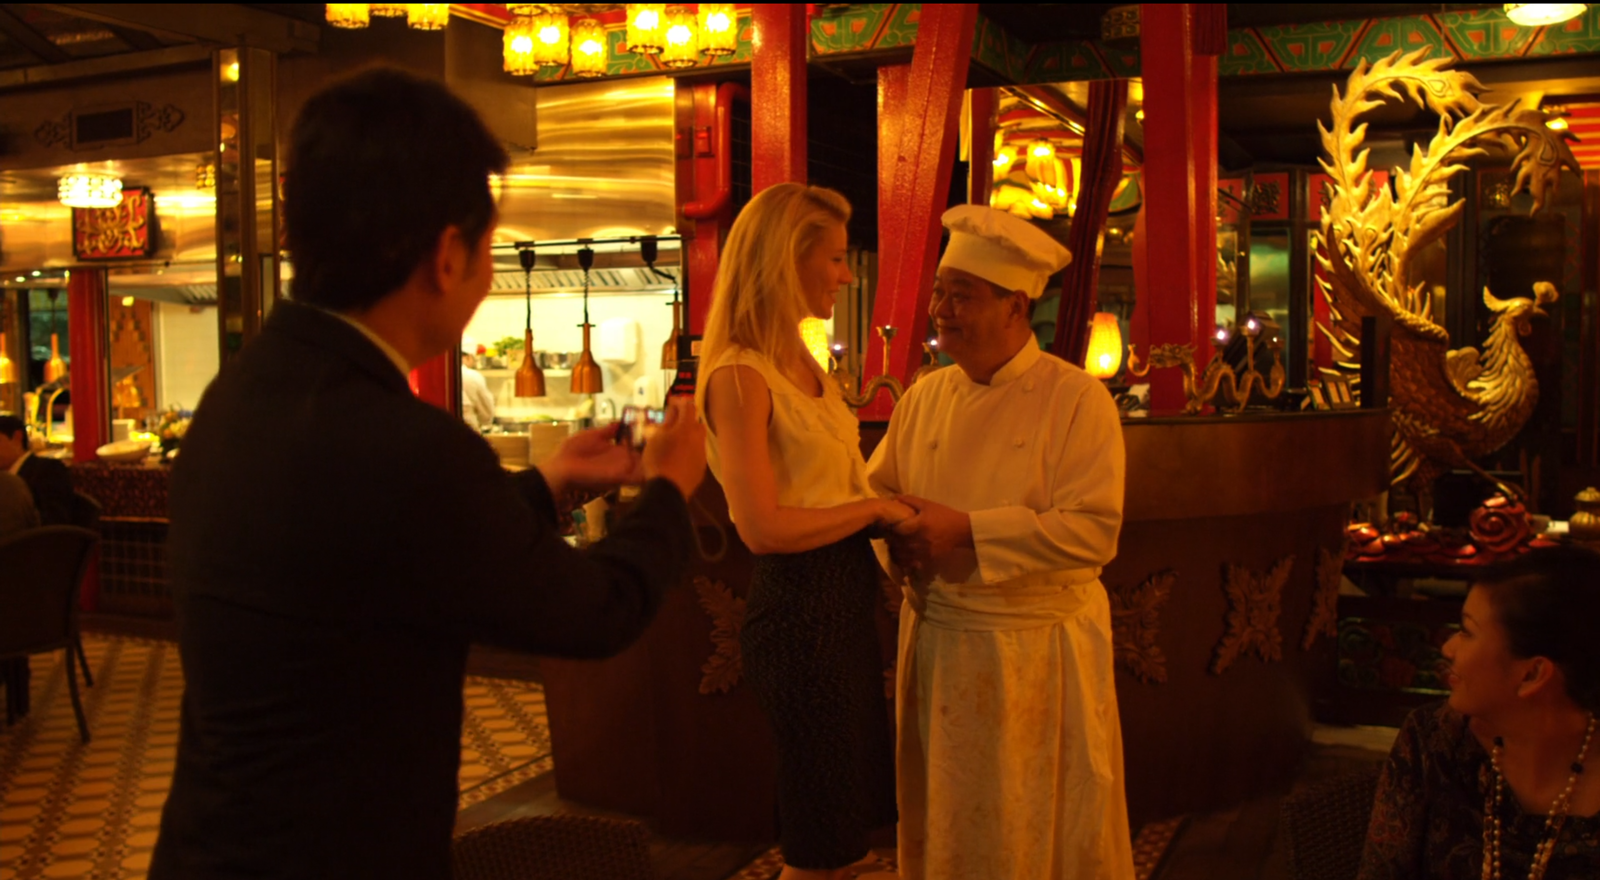 Händeschütteln in Macau. Filmstill aus Contagion (Soderbergh 2011).